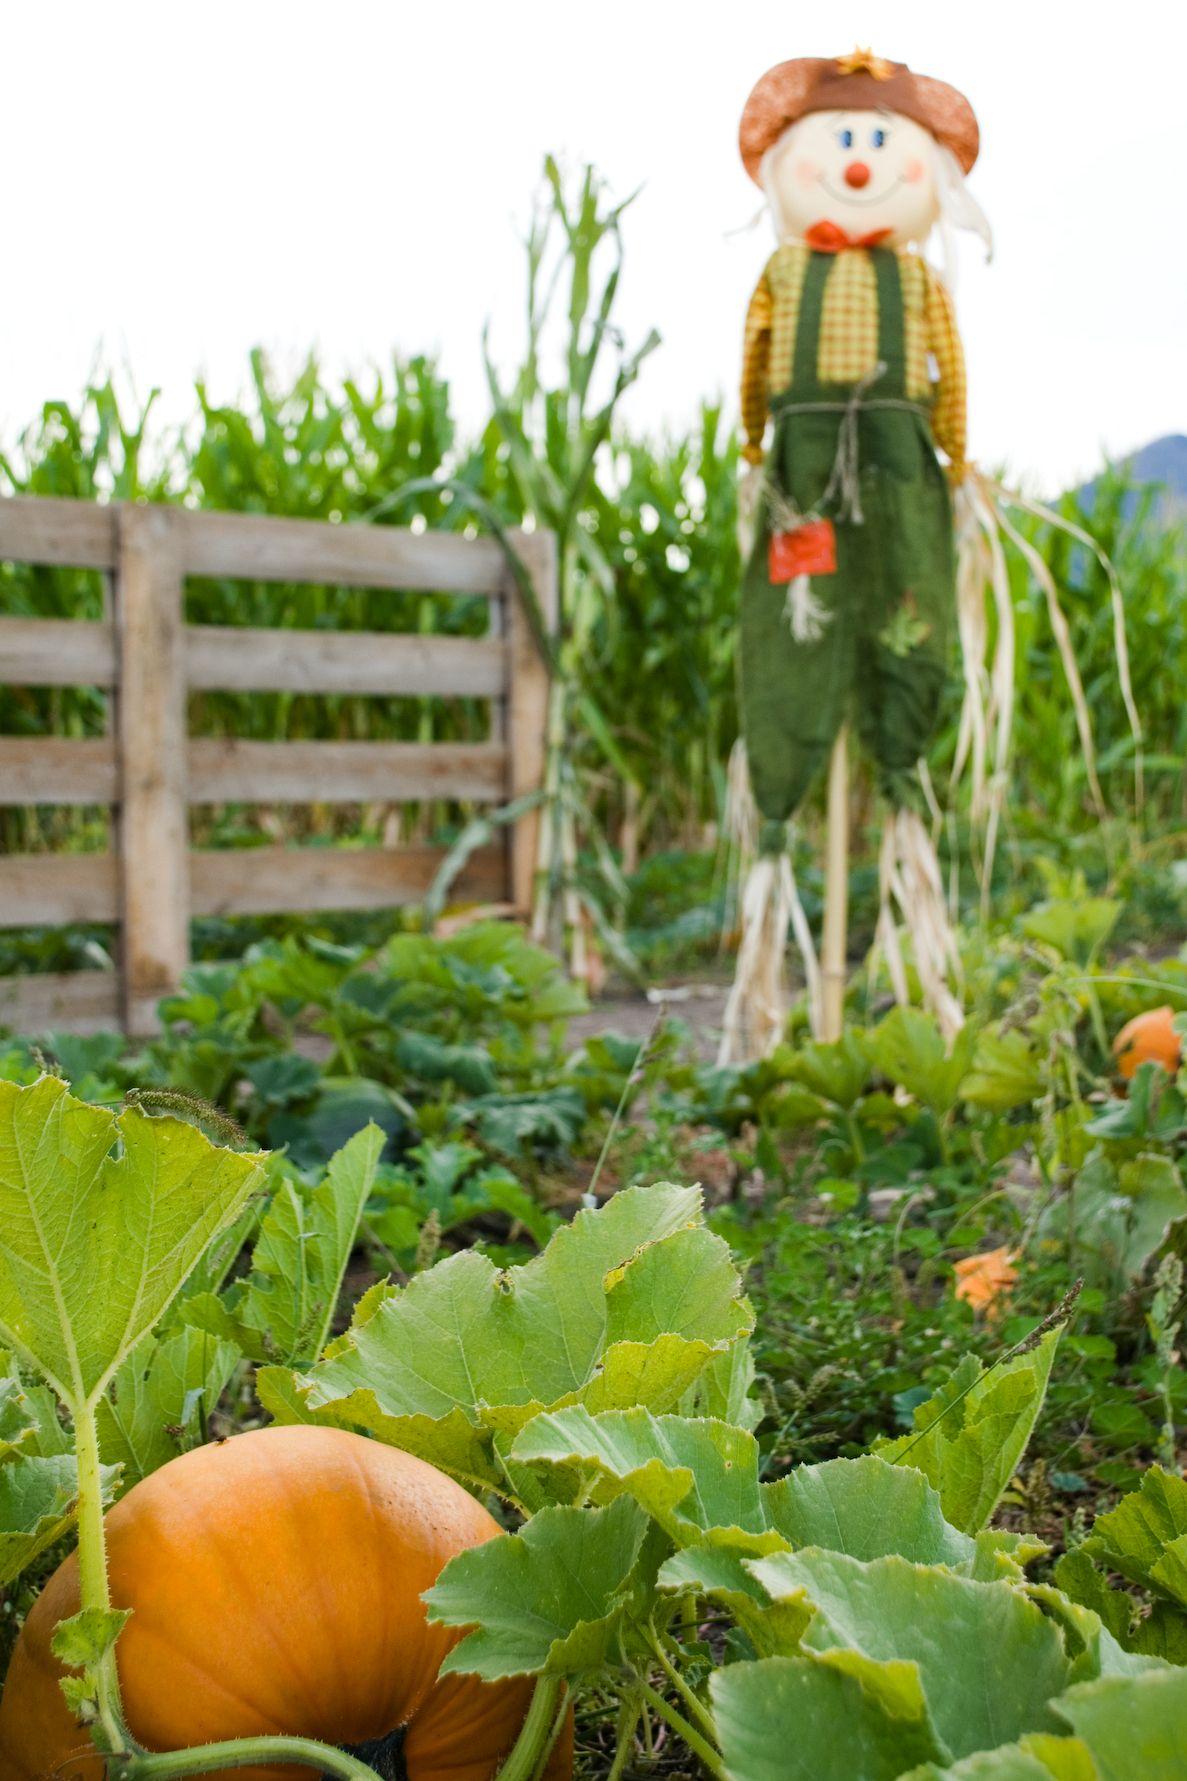 pumpkin patch arizona - pumpkin farms near me